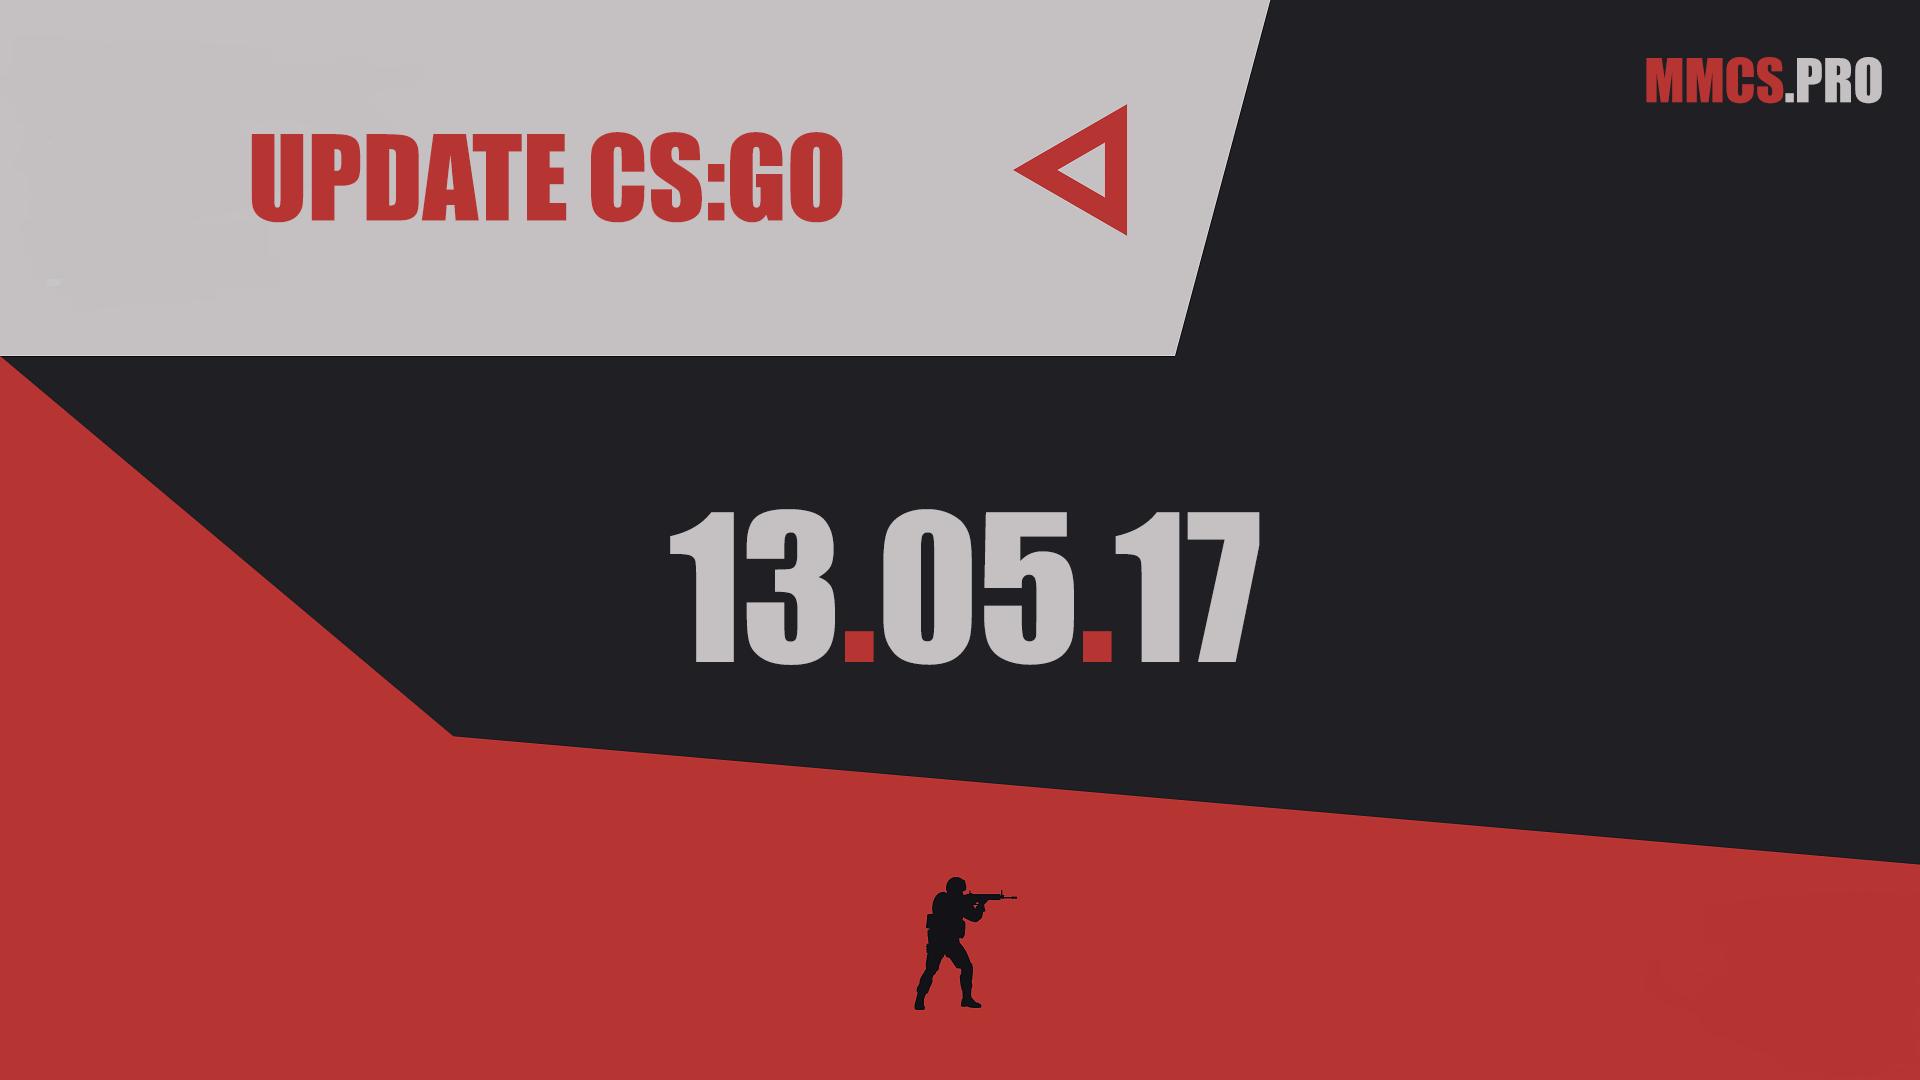 https://mmcs.pro/update-csgo-13-05-2017-valve/